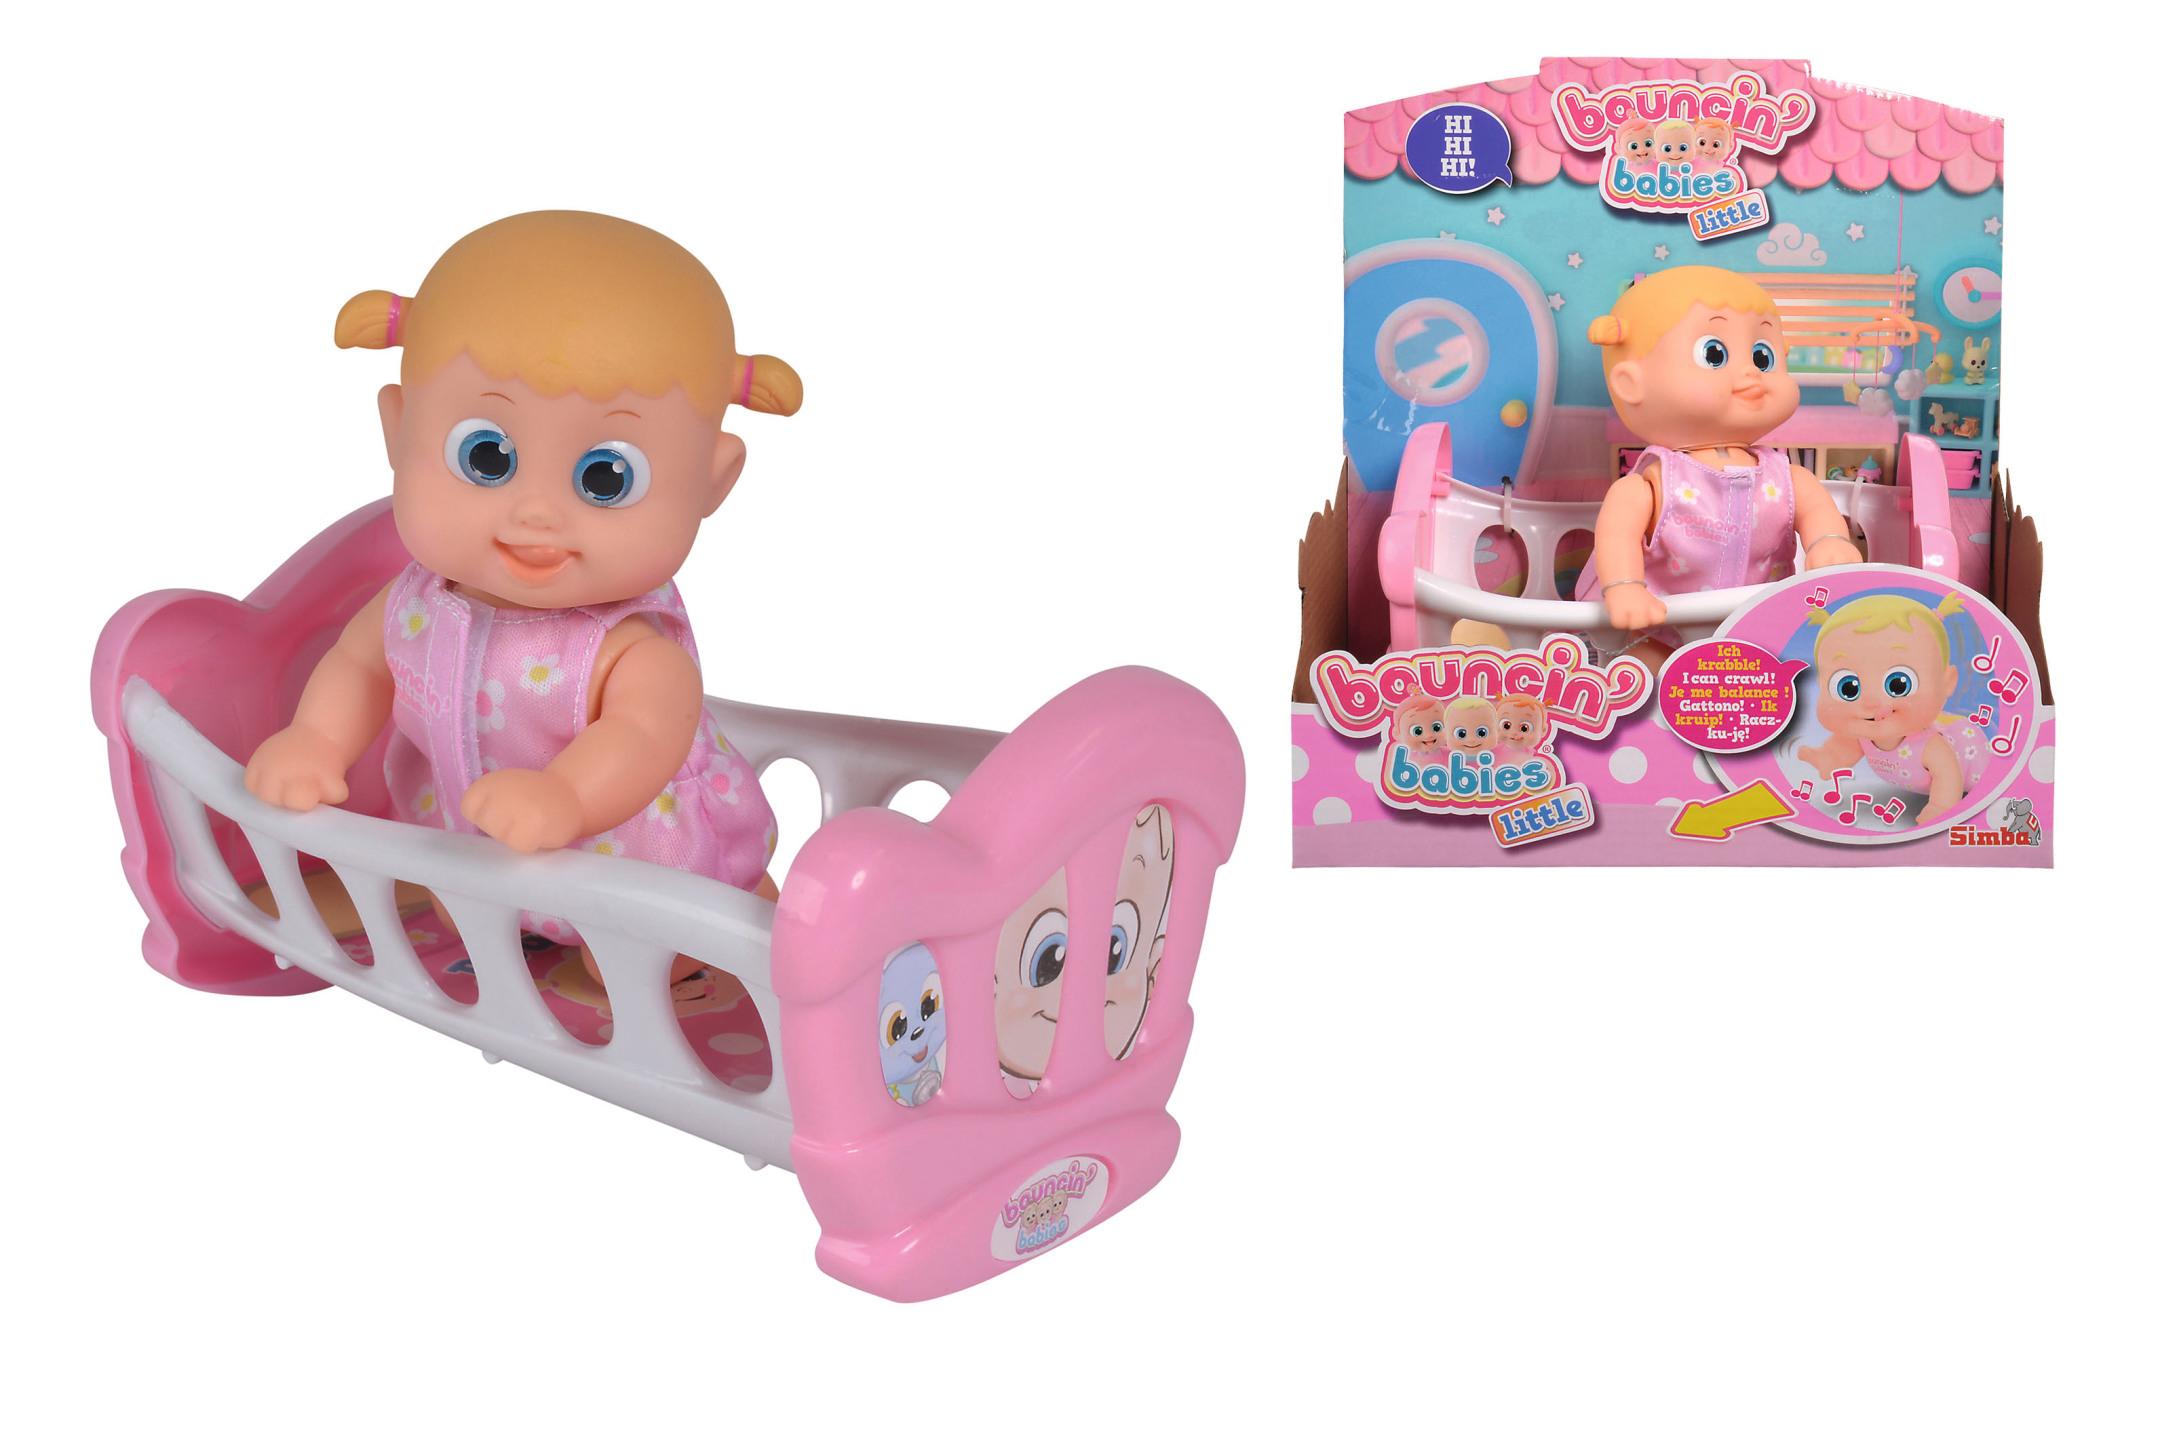 Bouncin Babies Little Bonny mit Wiege